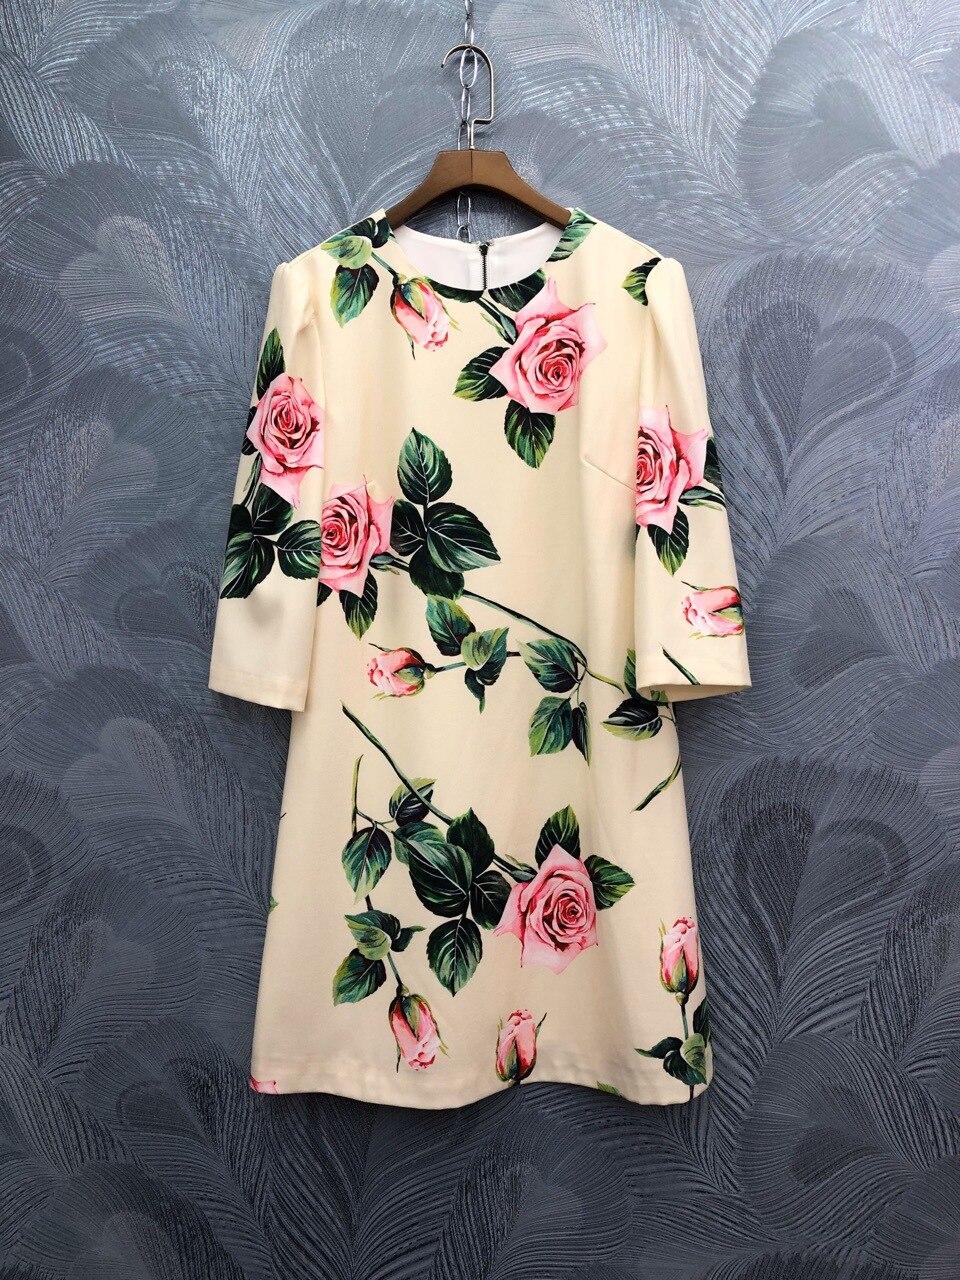 Spring summer runways floral print half sleeve sweet dress Fashion women's elegant dress B229 1